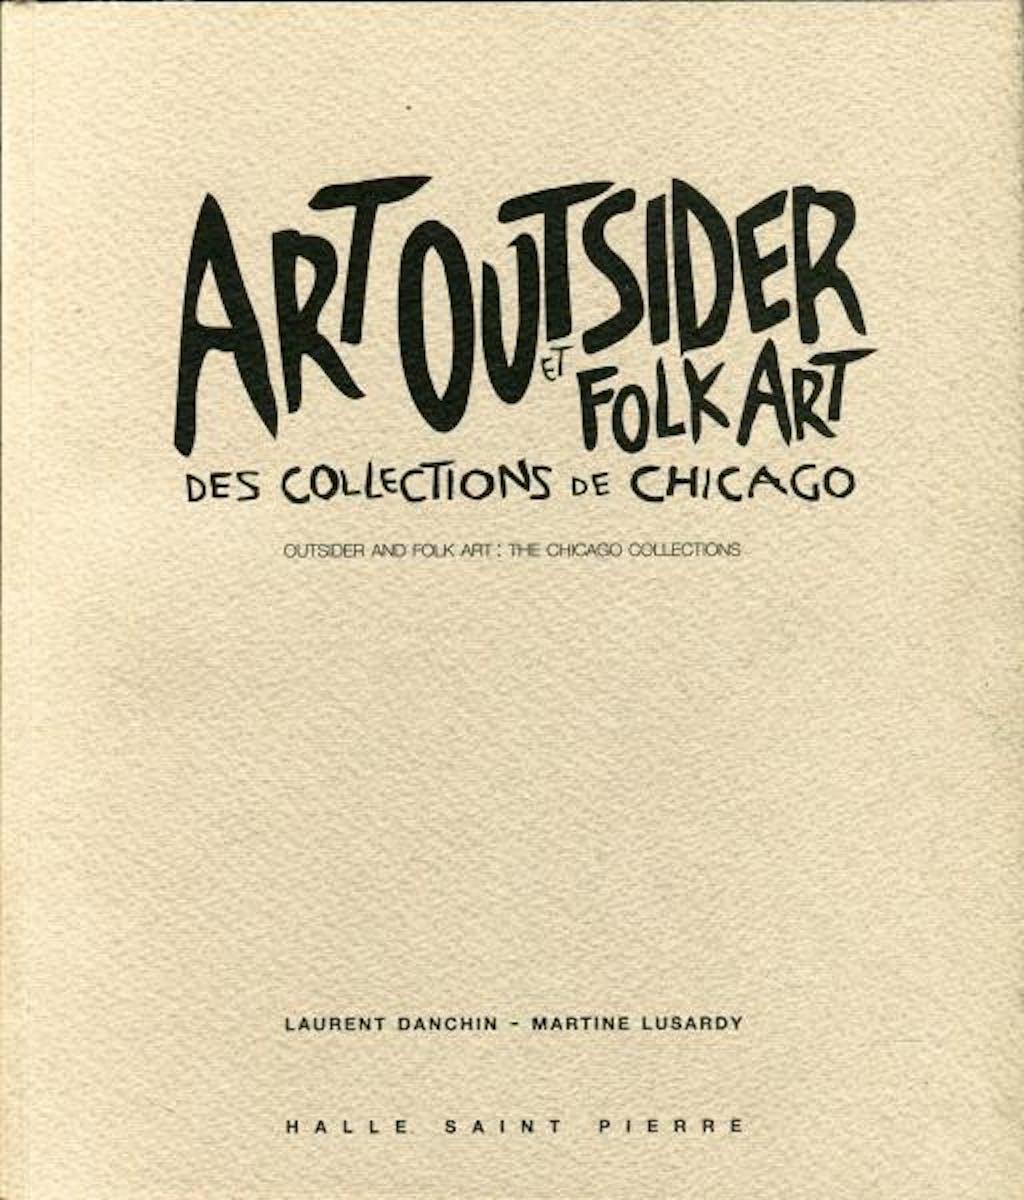 Art outsider et folk art des collections de Chicago - © christian berst — art brut